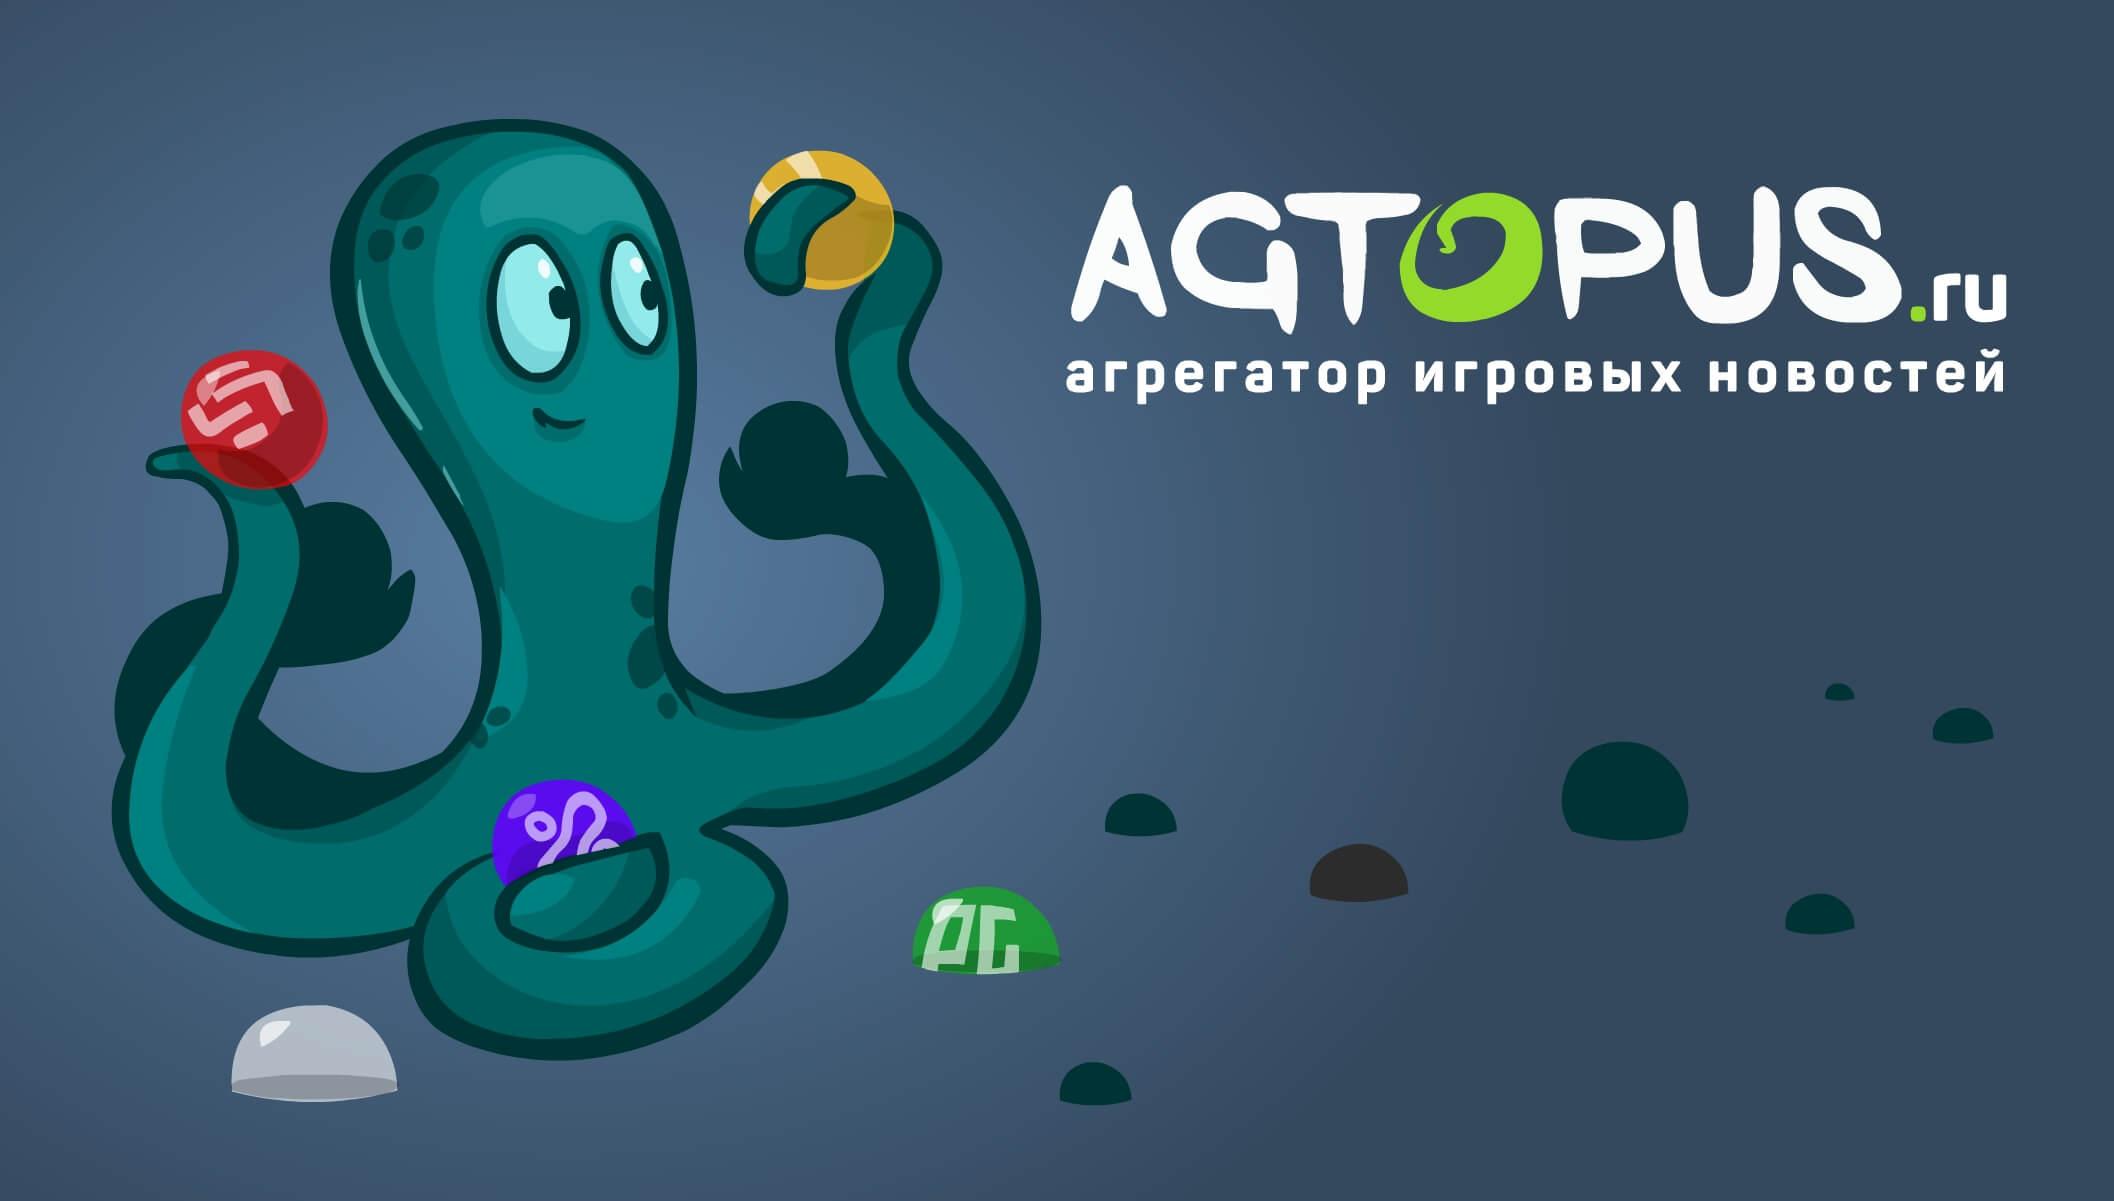 agtopus.ru